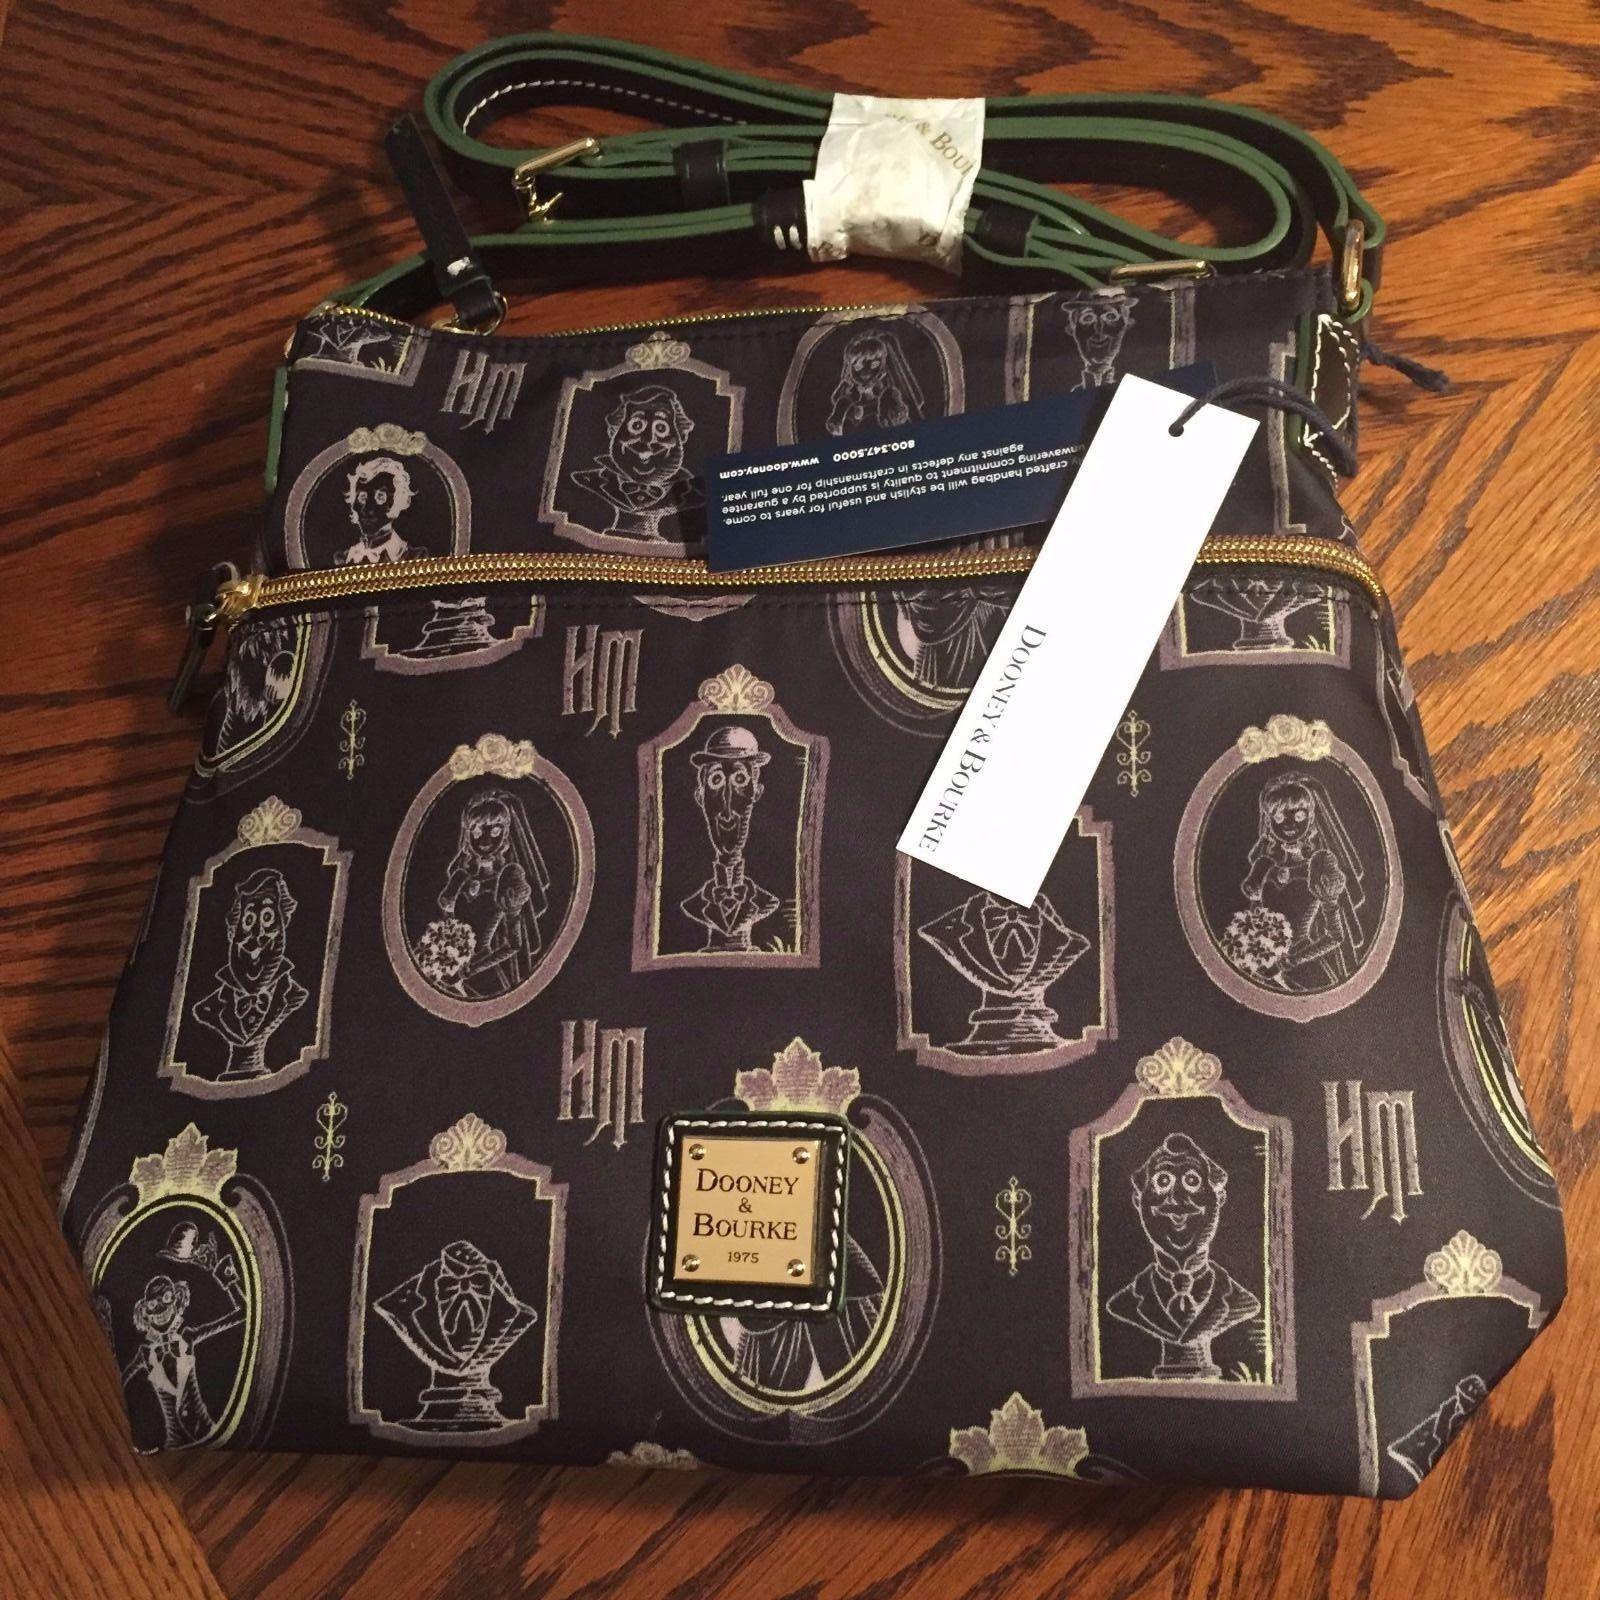 Disney Haunted Mansion Dooney Bourke Portrait Crossbody Bag Purse Sold Out Ebay Bags Purses Bags Bags Purses